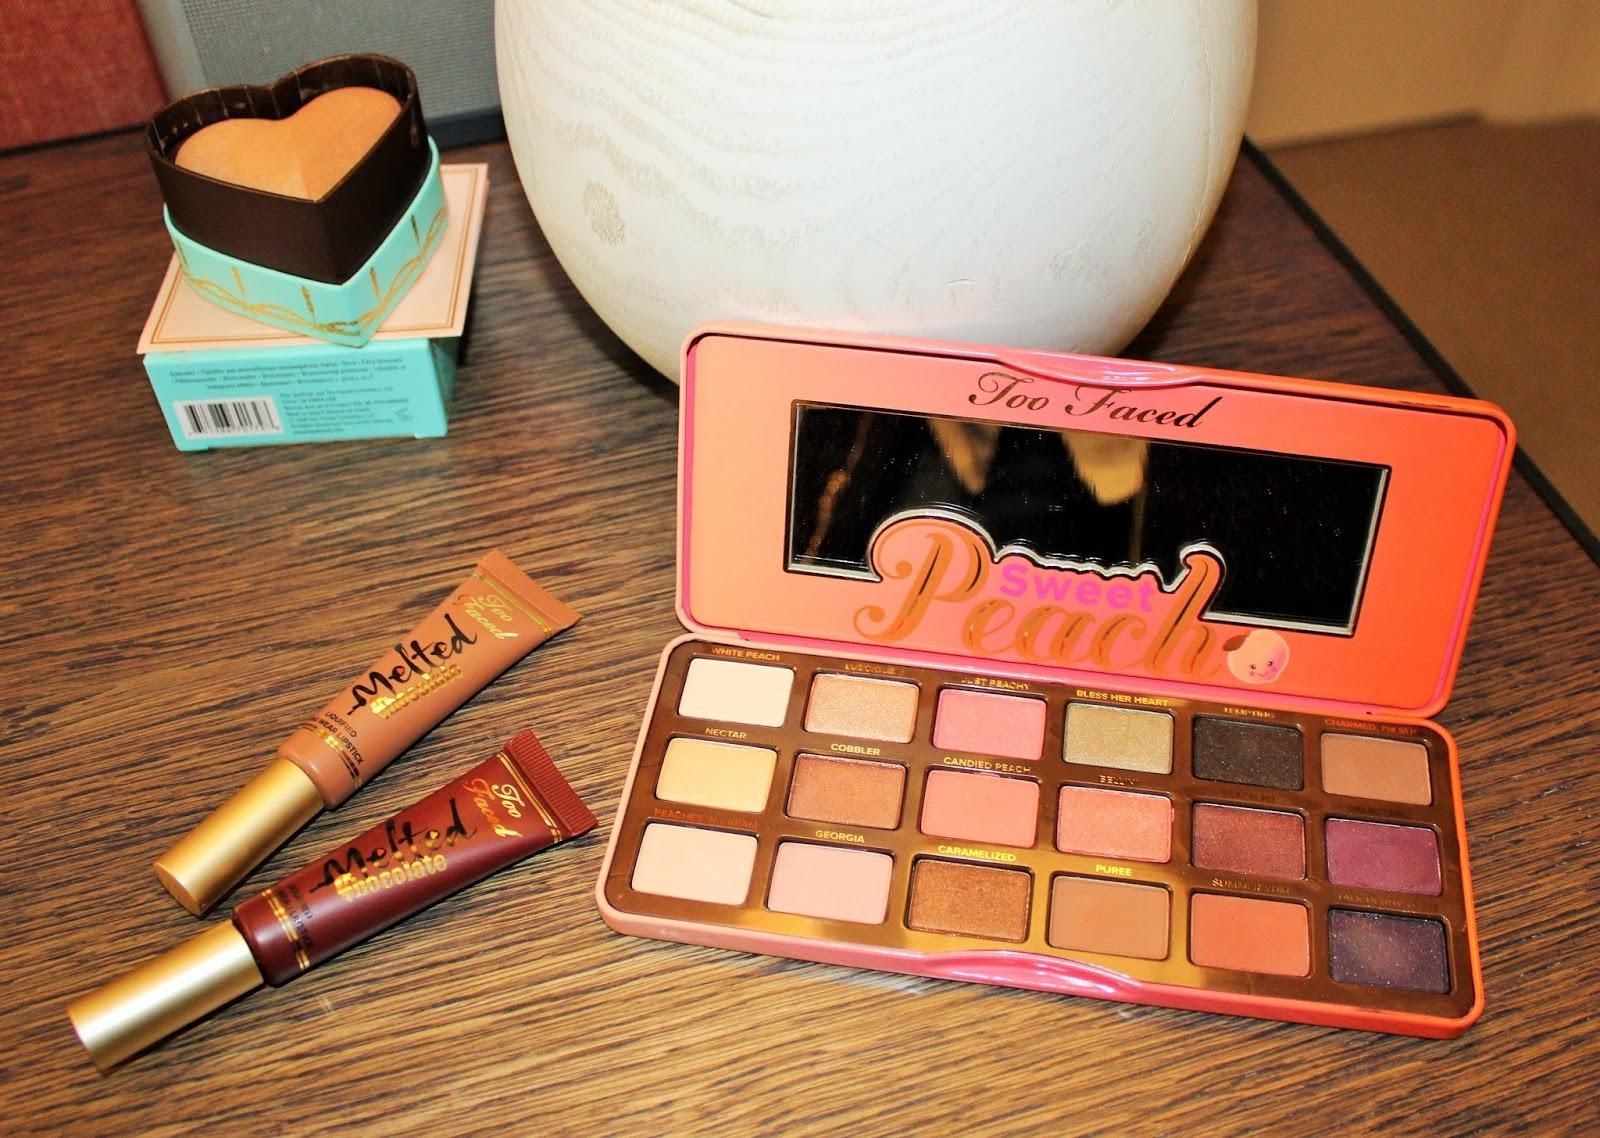 Debenhams Beauty Press Day - SS16 6 - Too Faced Sweet Peach Eyeshadow Palette